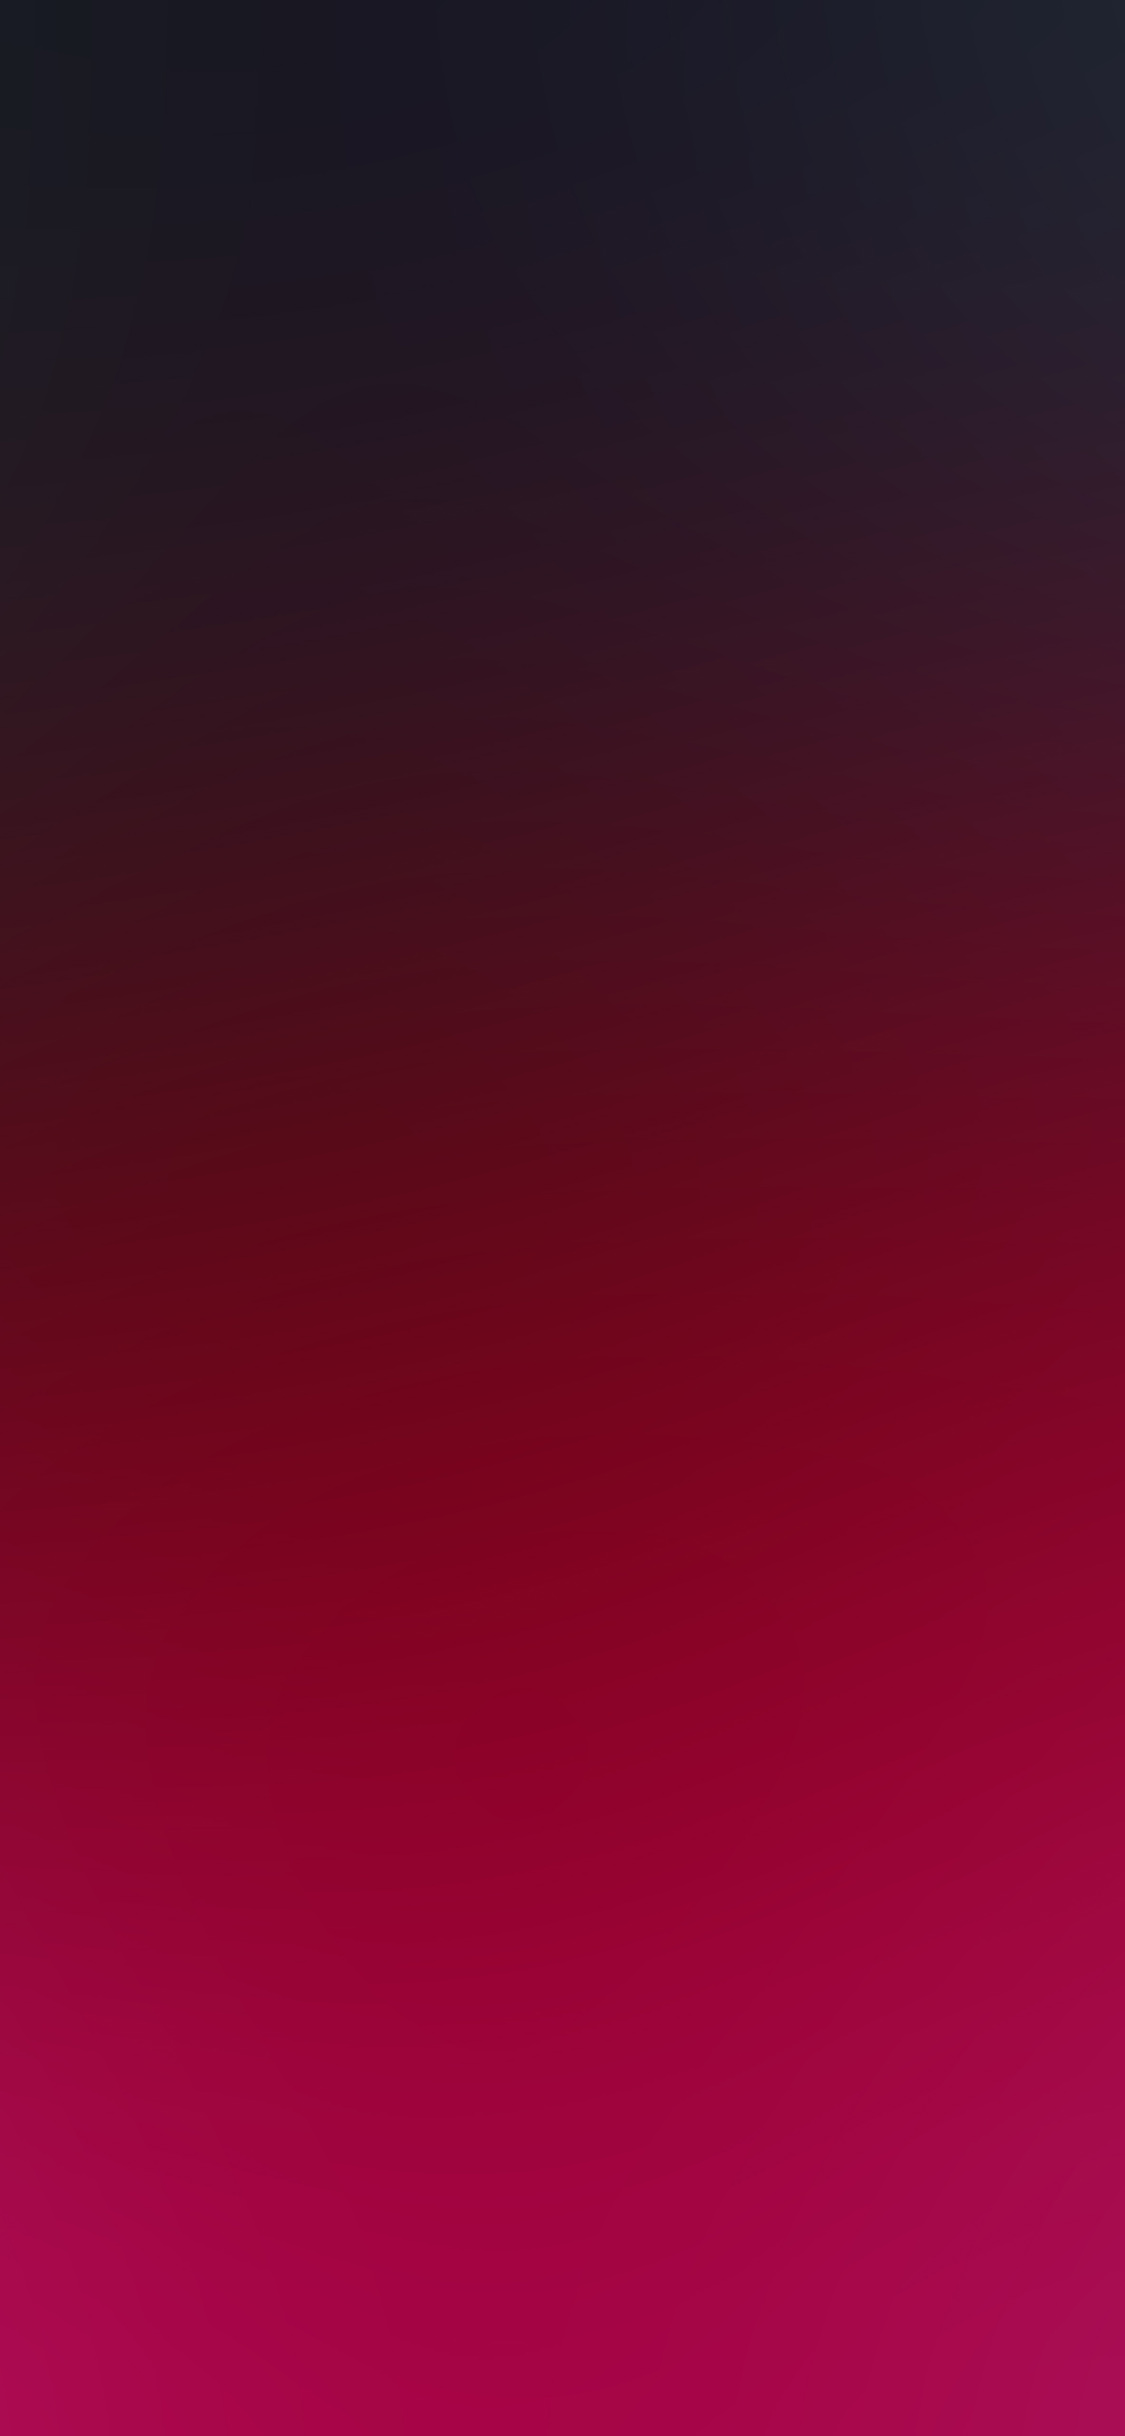 Papers Co Iphone Wallpaper Sh76 Red Dark Gradation Blur